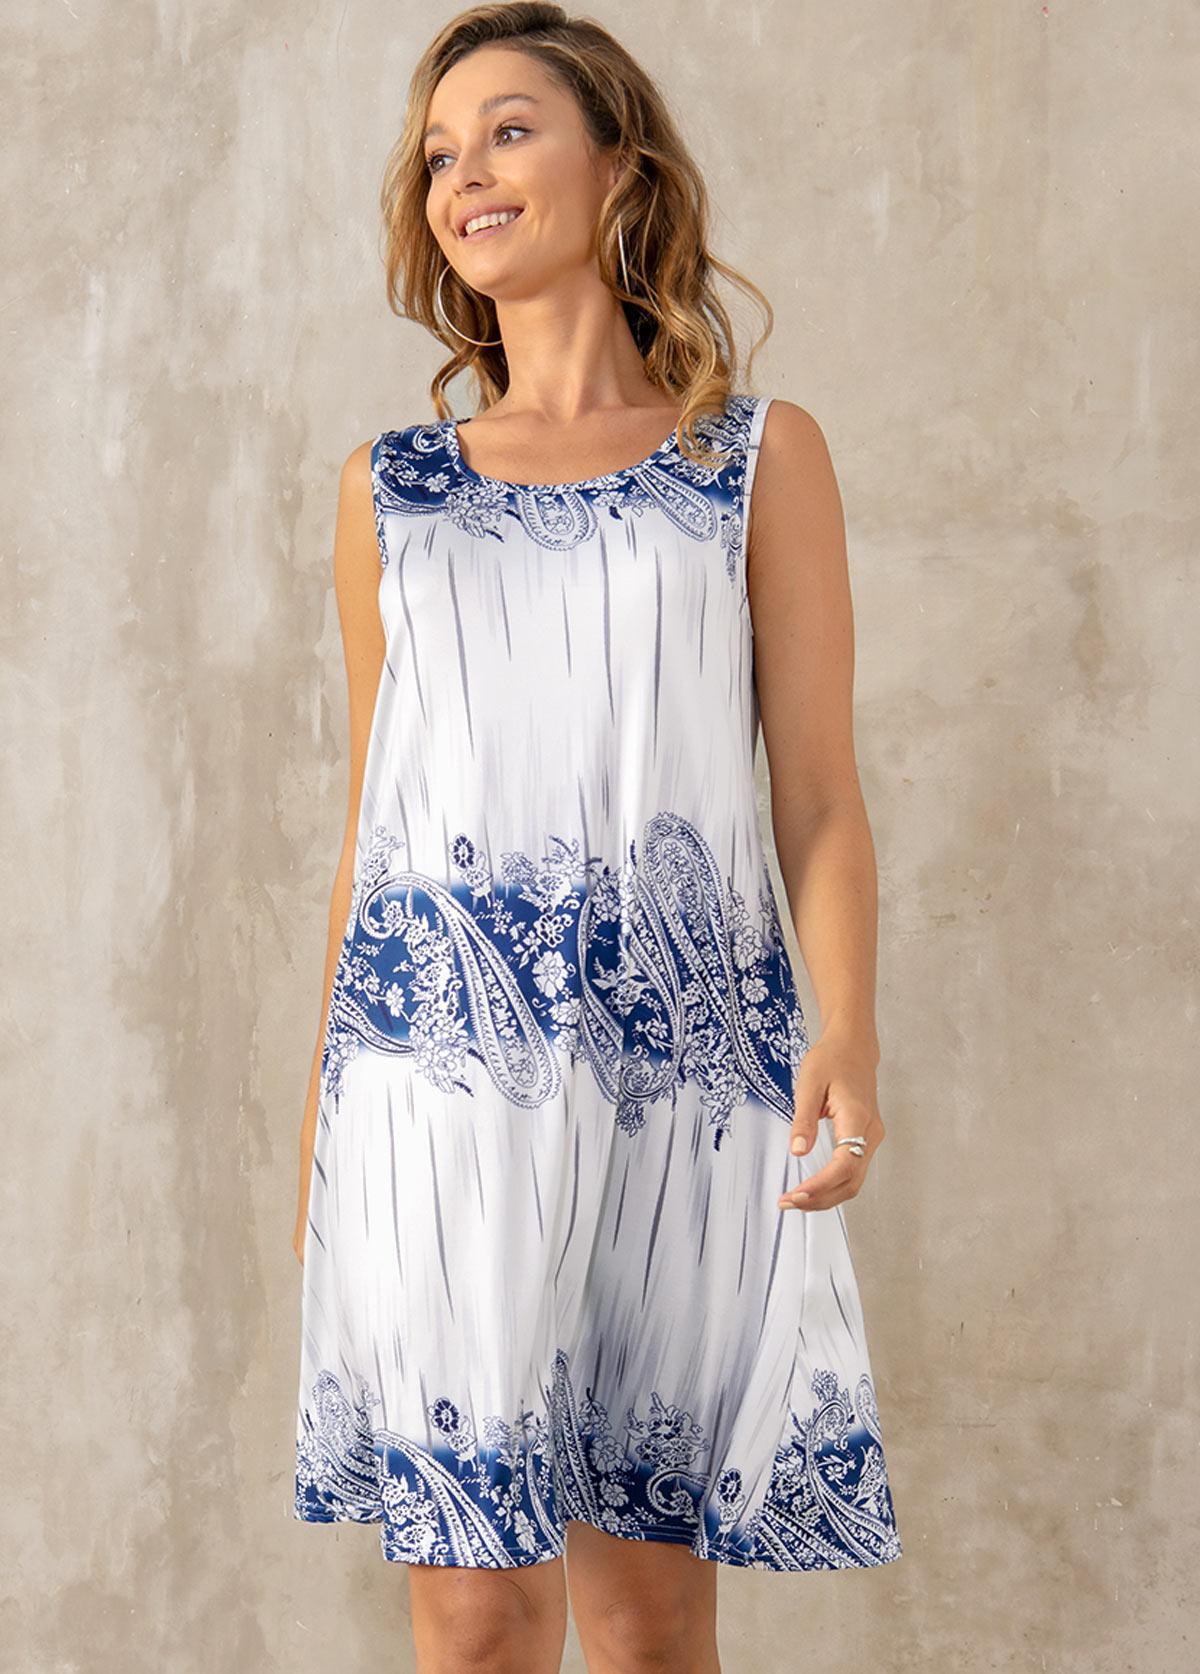 Paisley Print Round Neck Sleeveless Dress